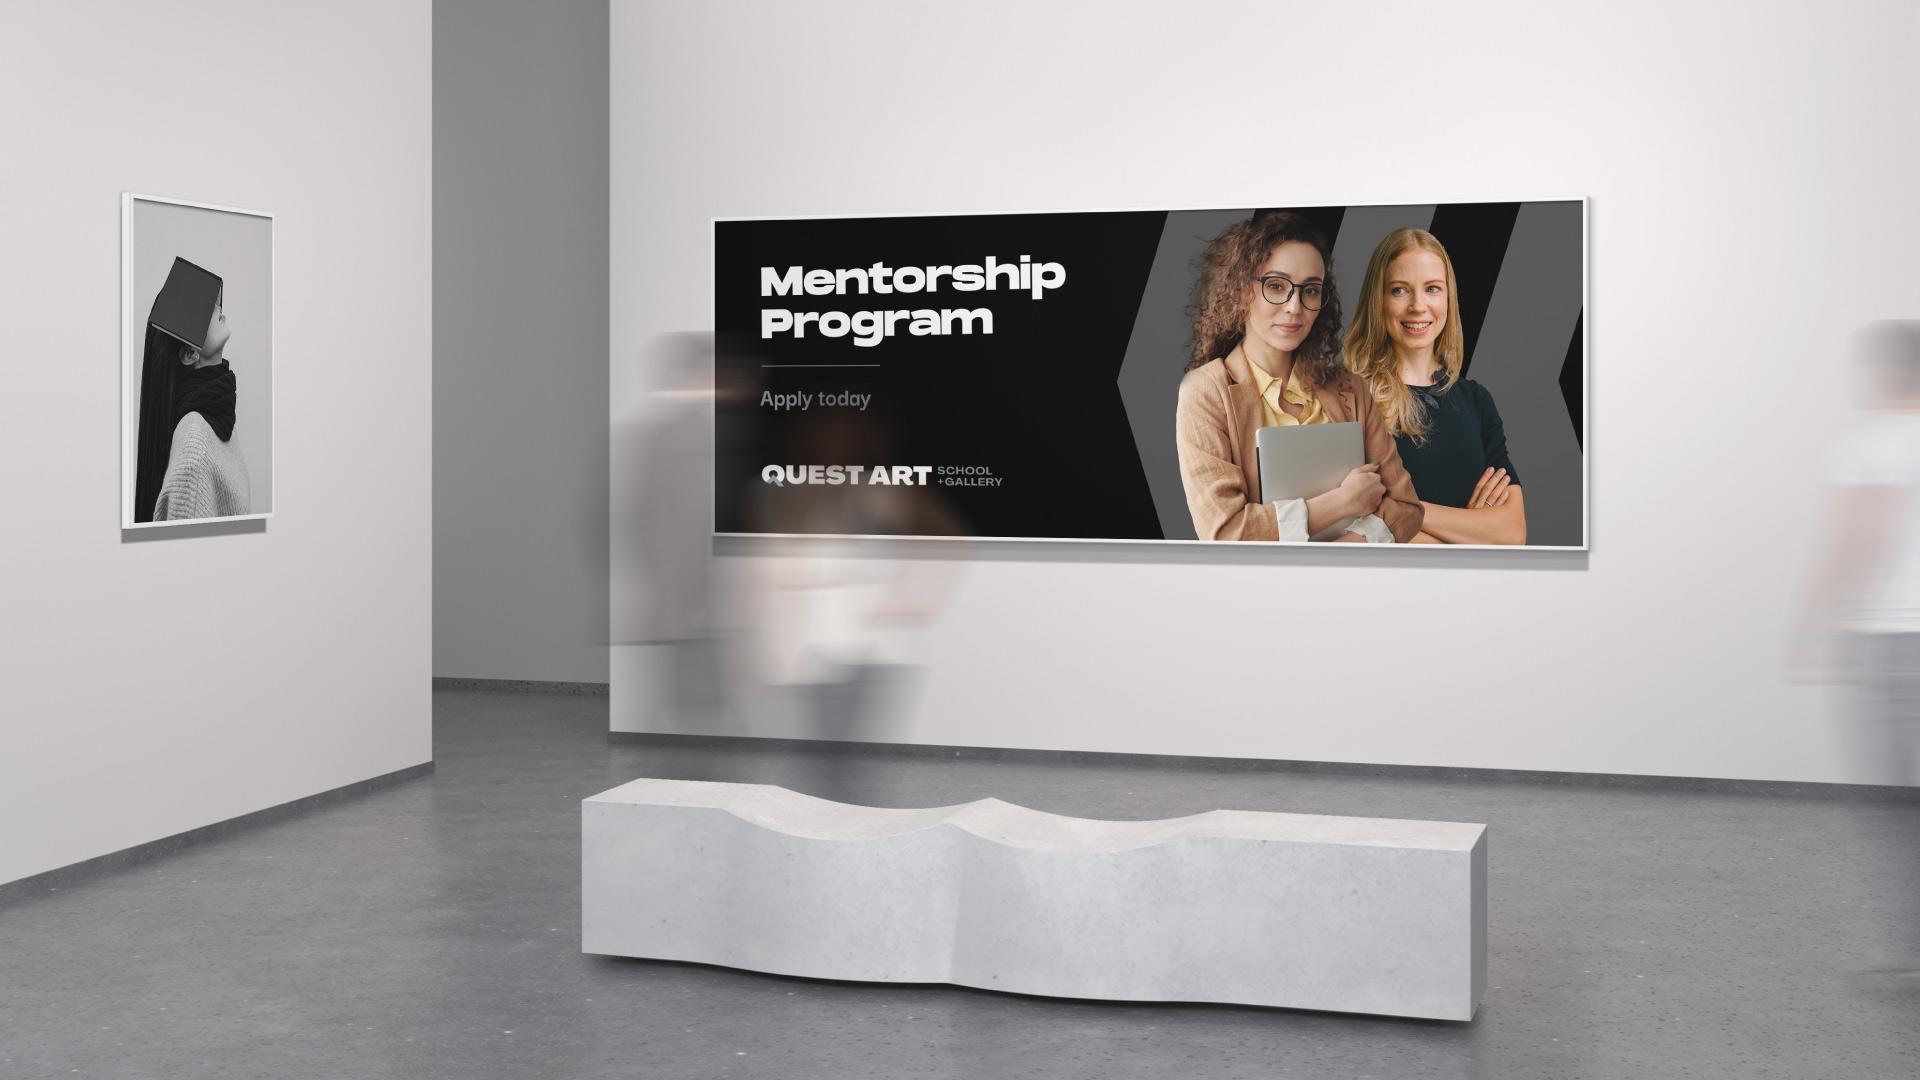 quest art school and gallery mentorship program banner design